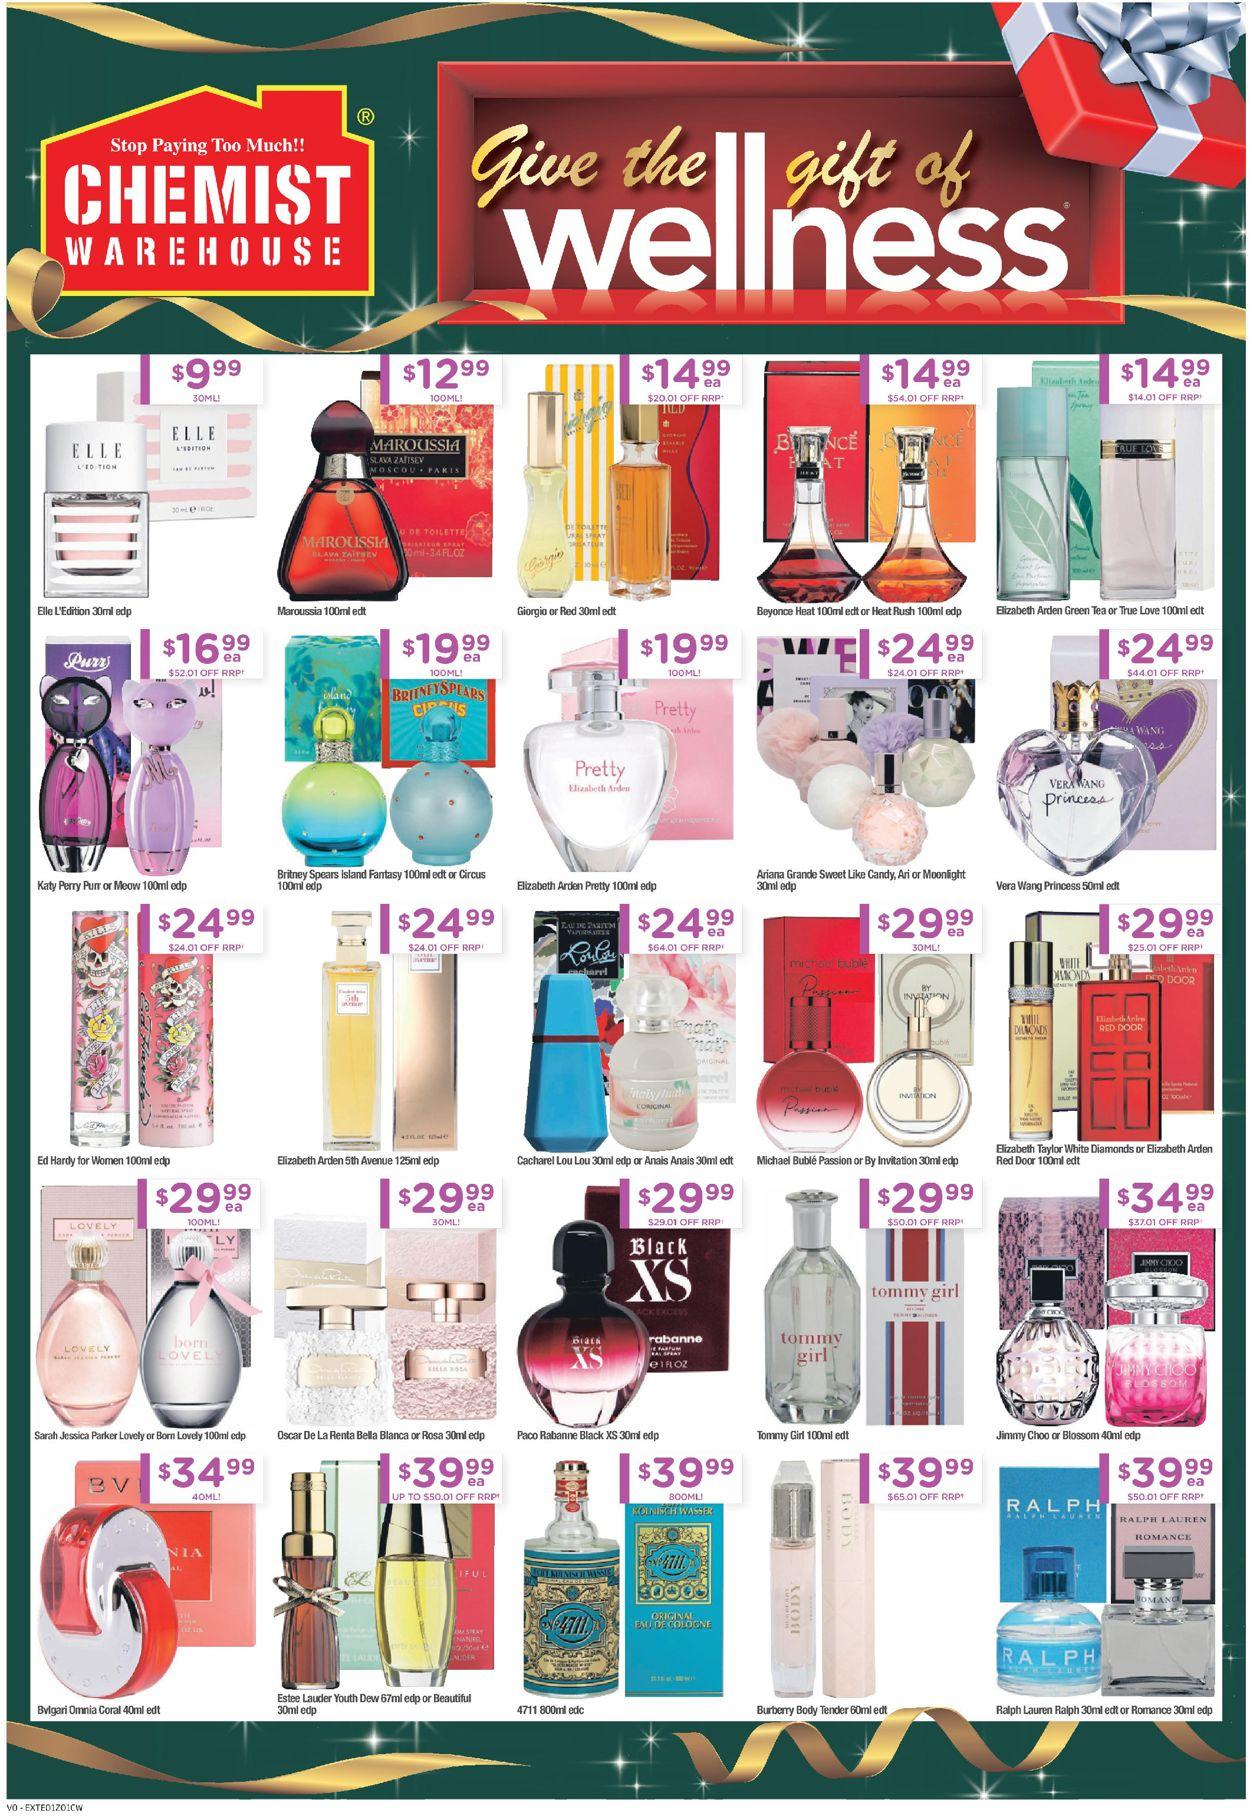 Chemist Warehouse - Christmas 2020 Catalogue - 14/12-24/12/2020